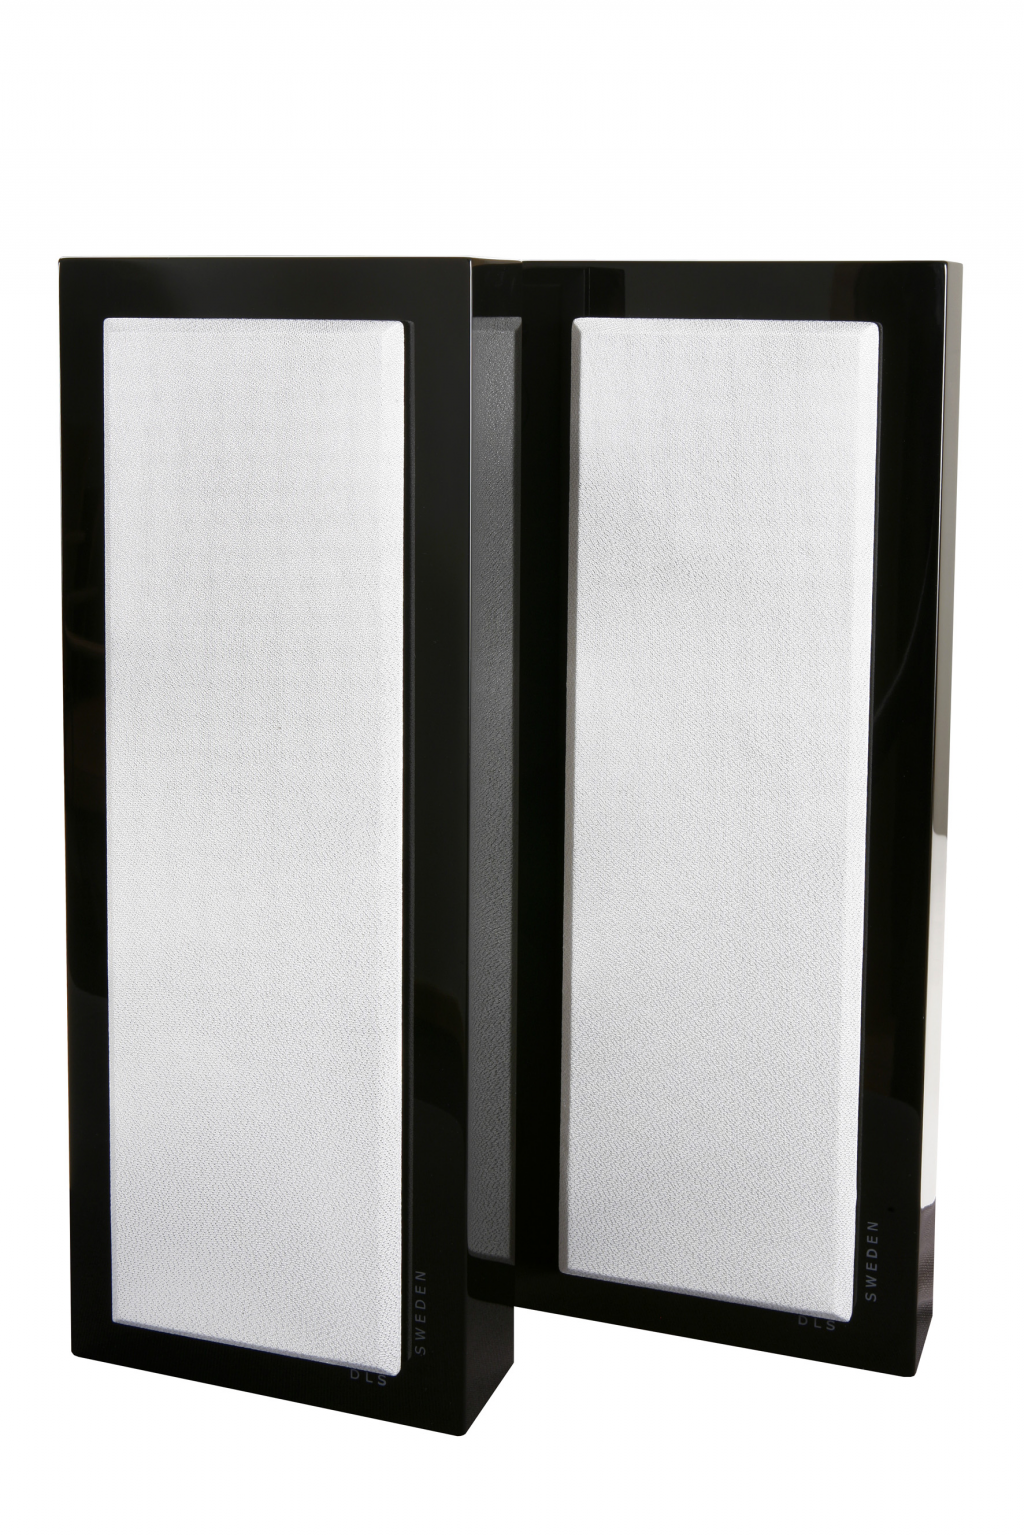 FLATBOX Slim Large-V2 Svart